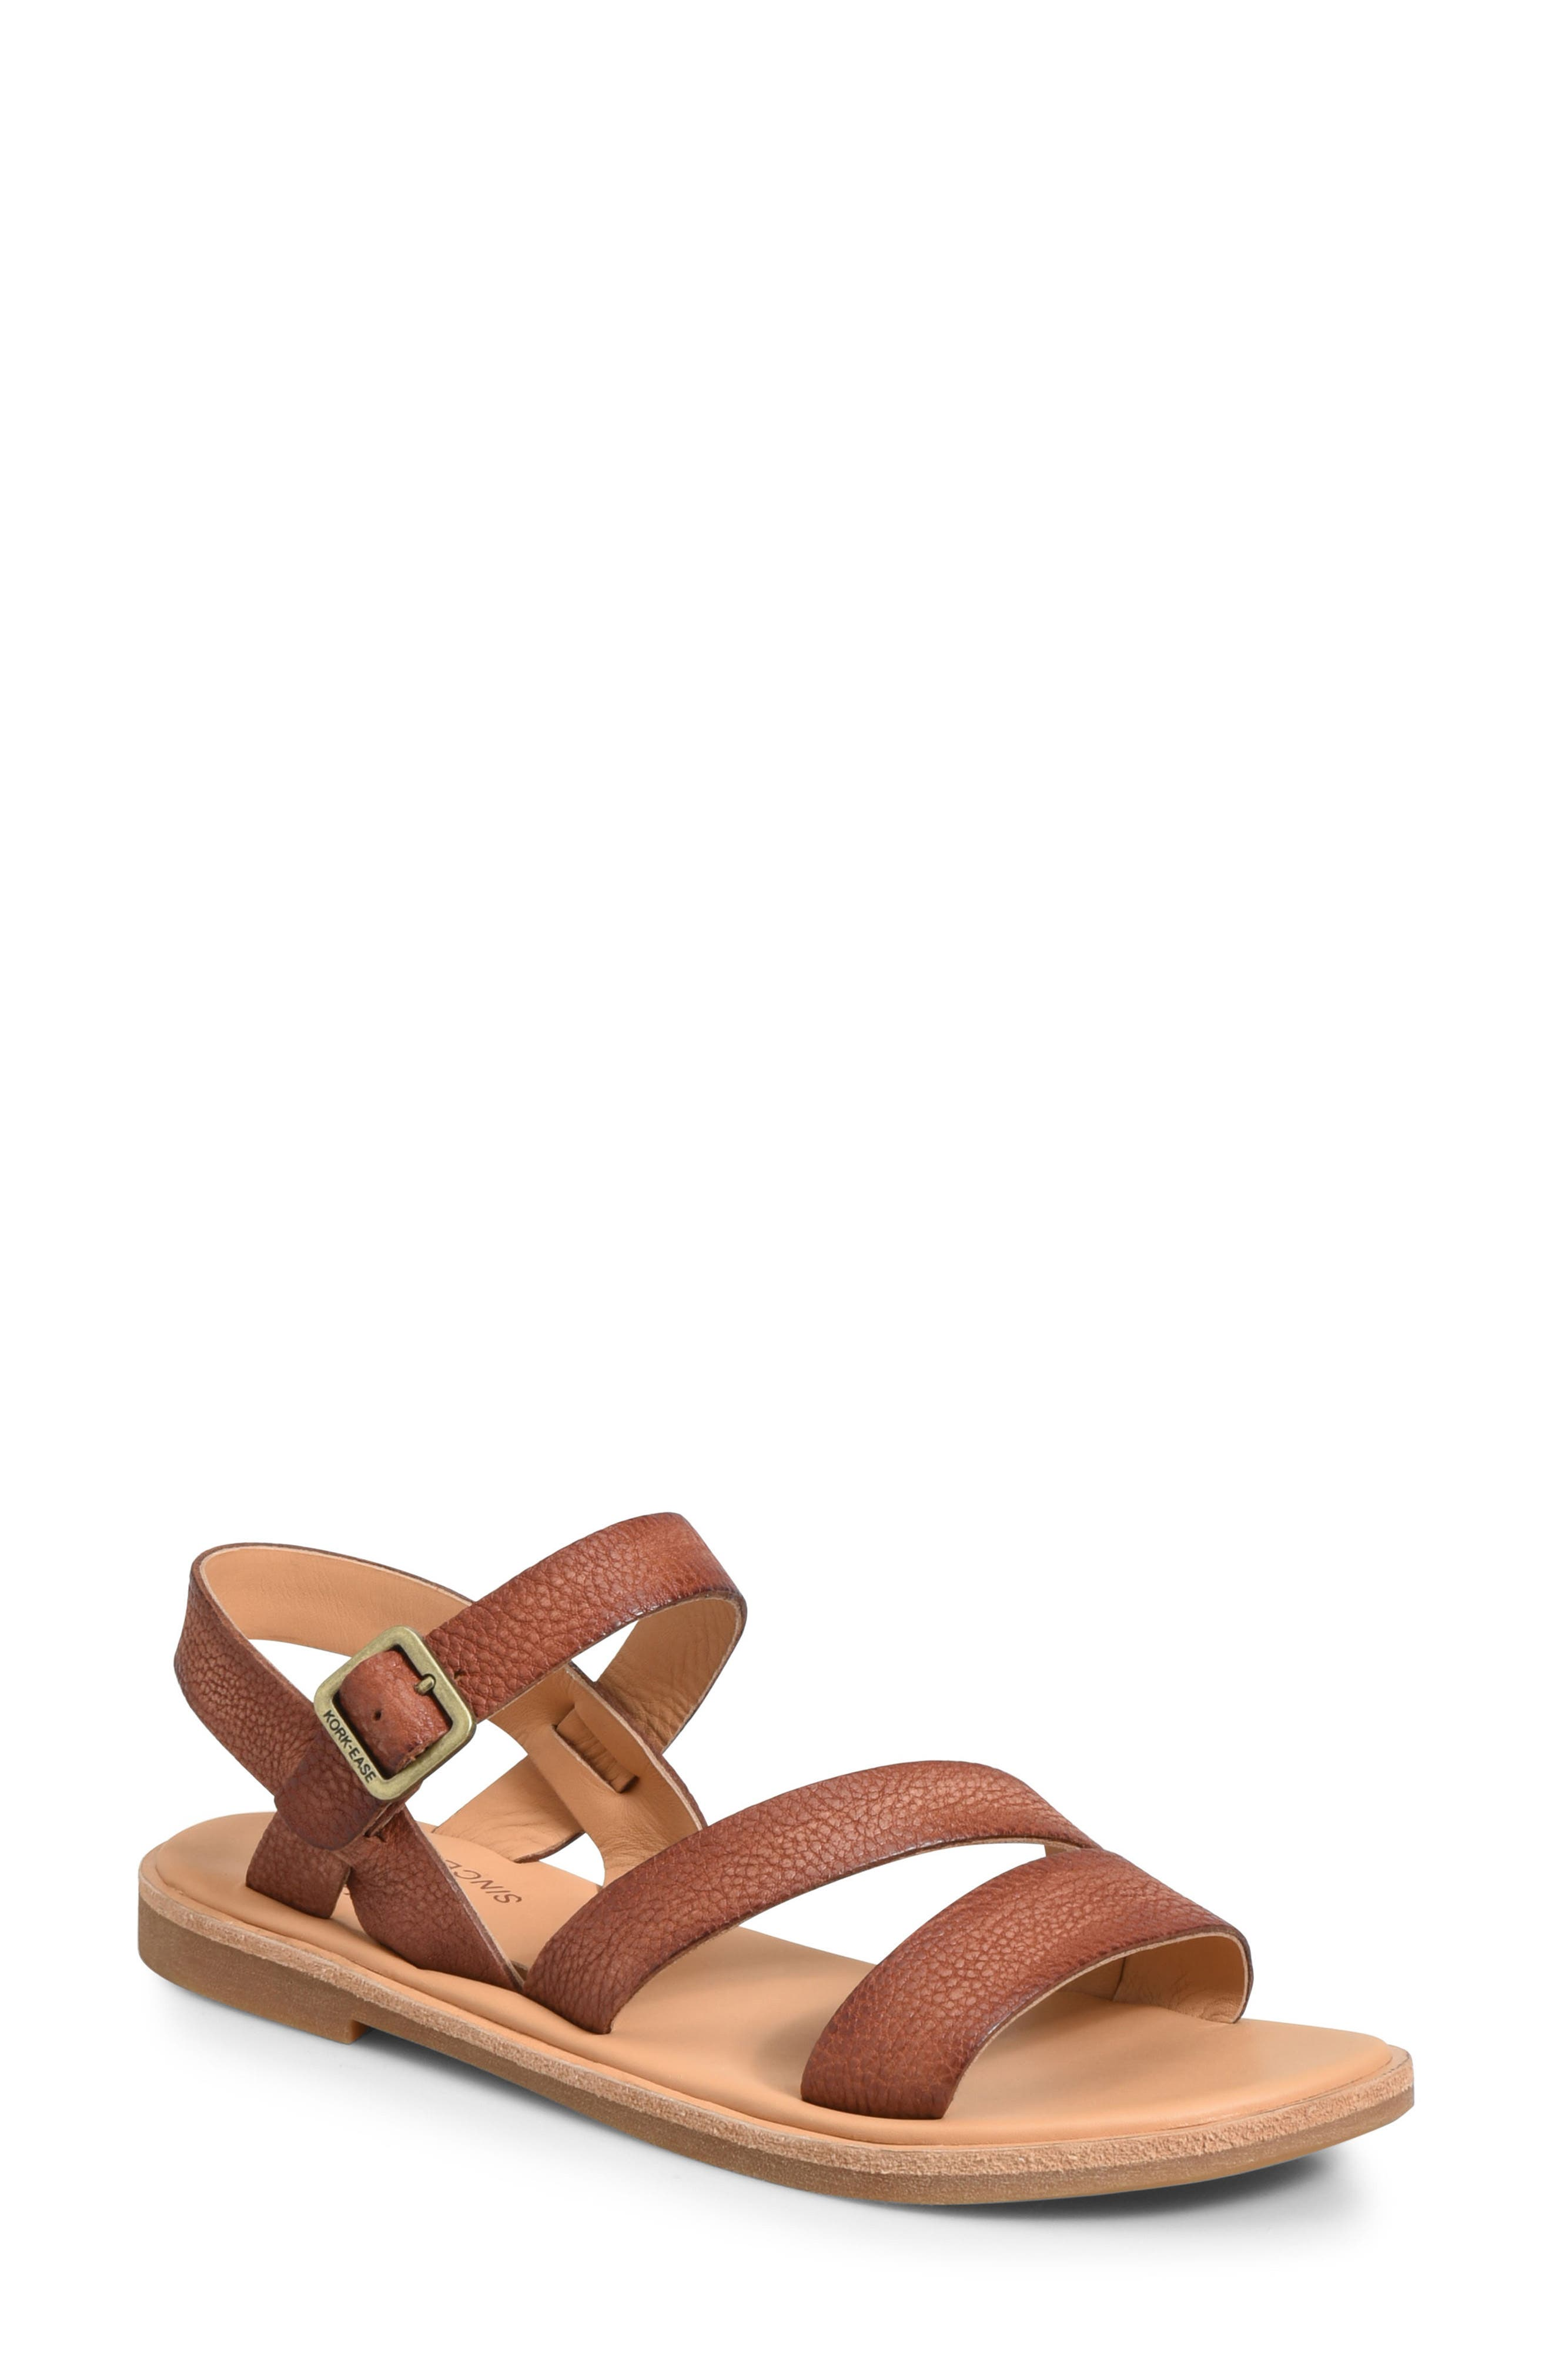 Nogales Sandal,                         Main,                         color, Brown Leather